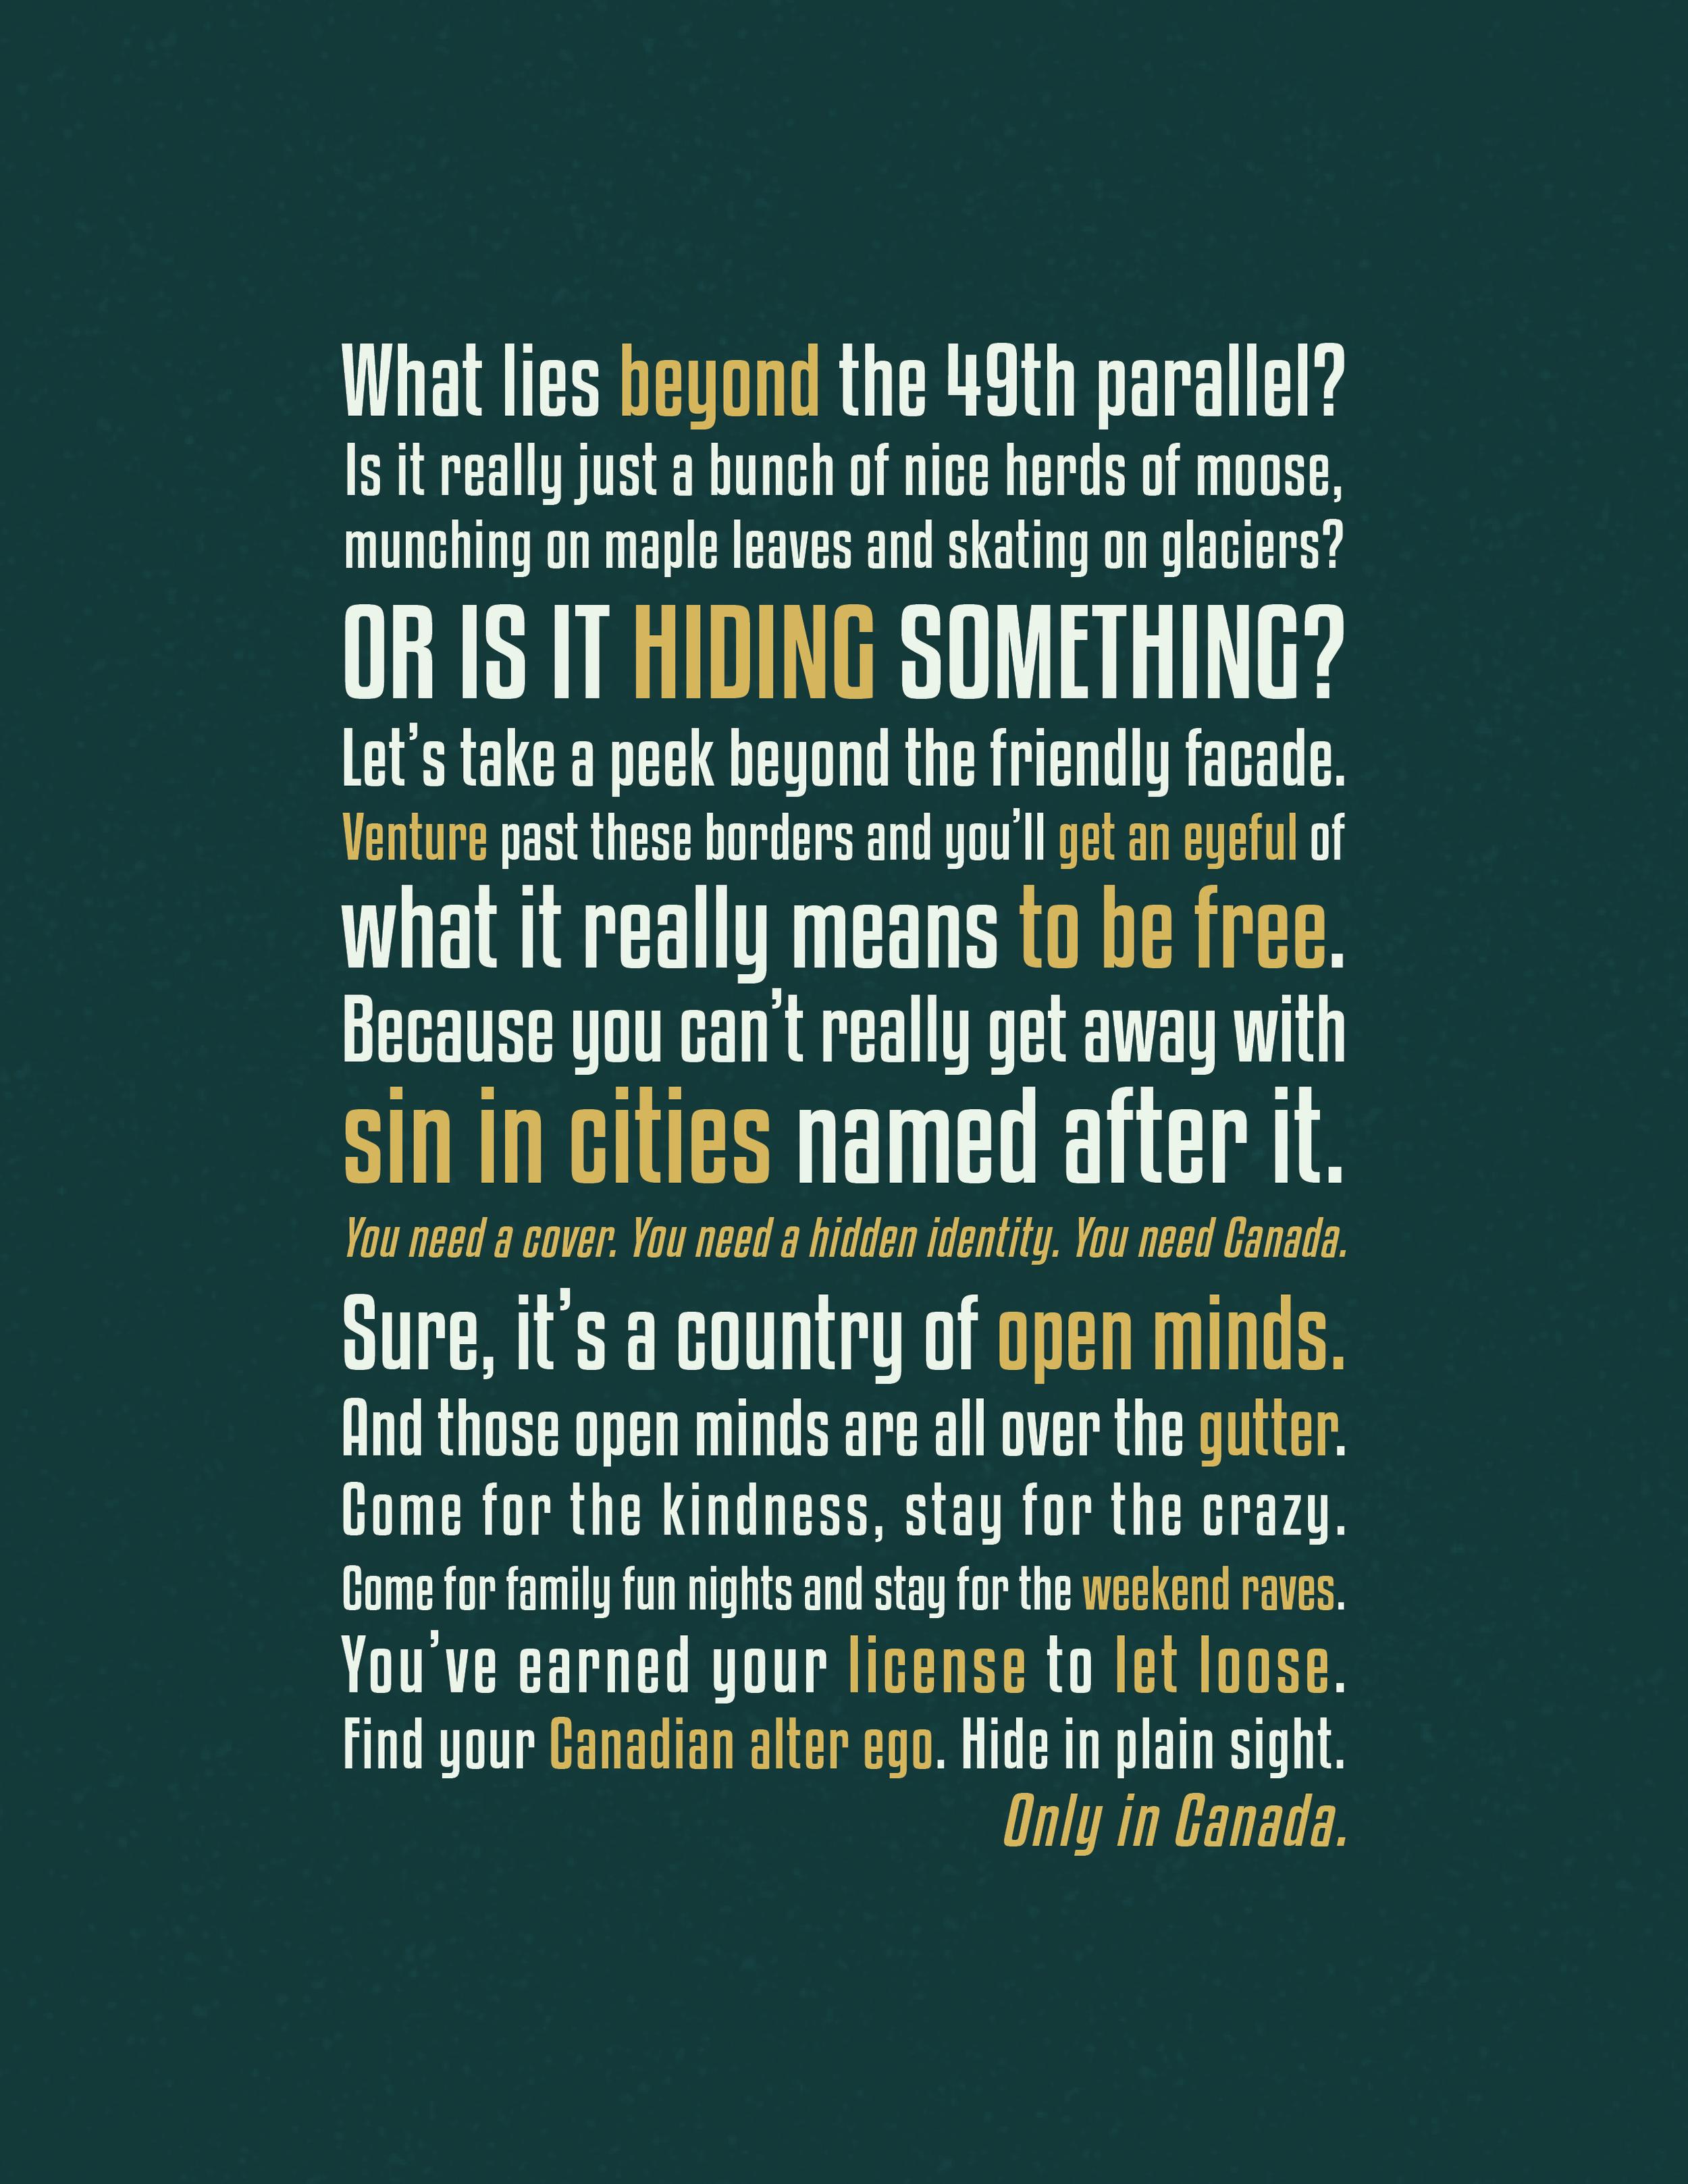 Canada_Manifesto.png